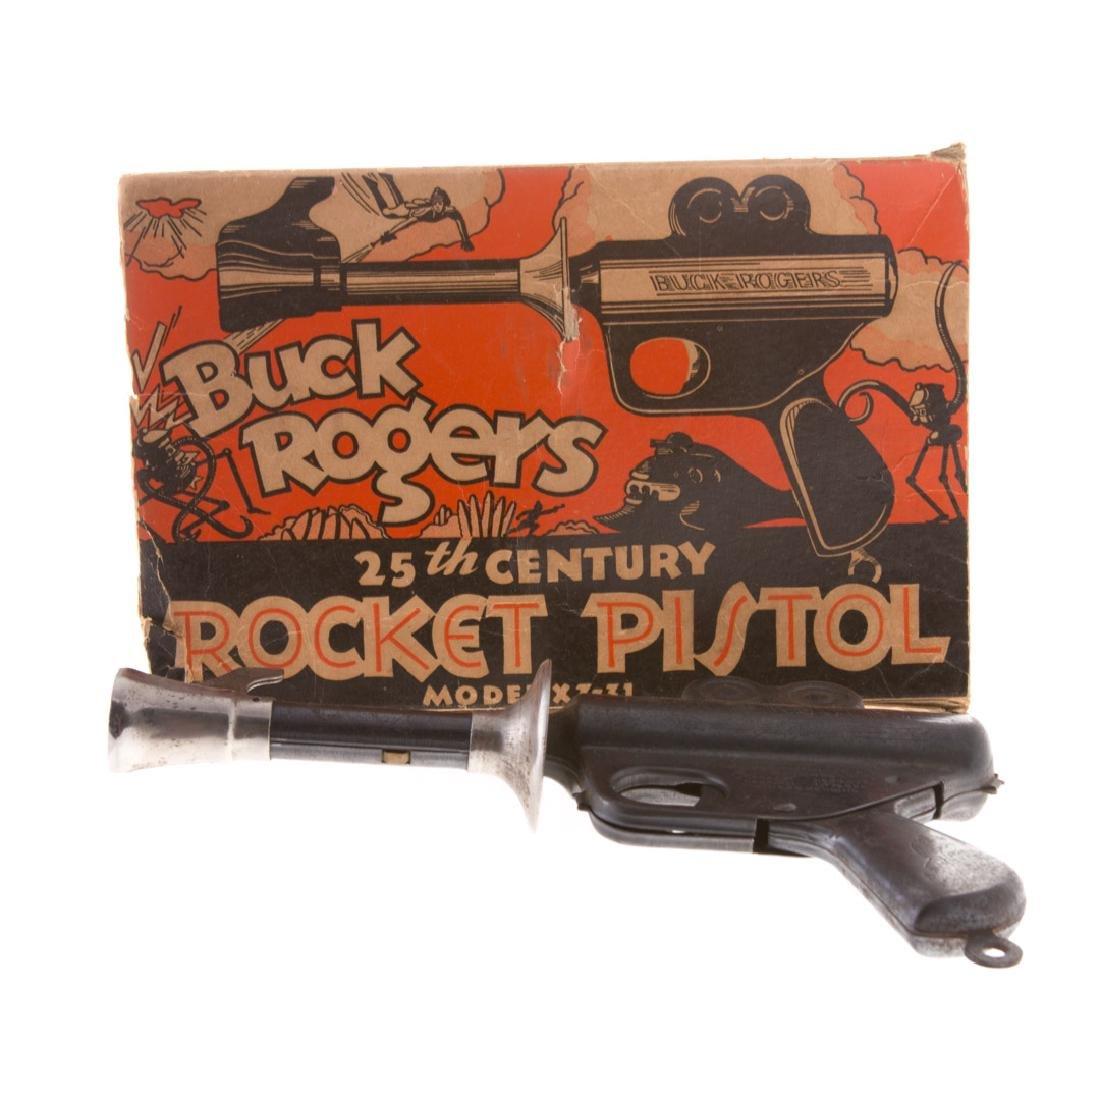 Buck Rogers 25th Century Rocket Pistol with Box